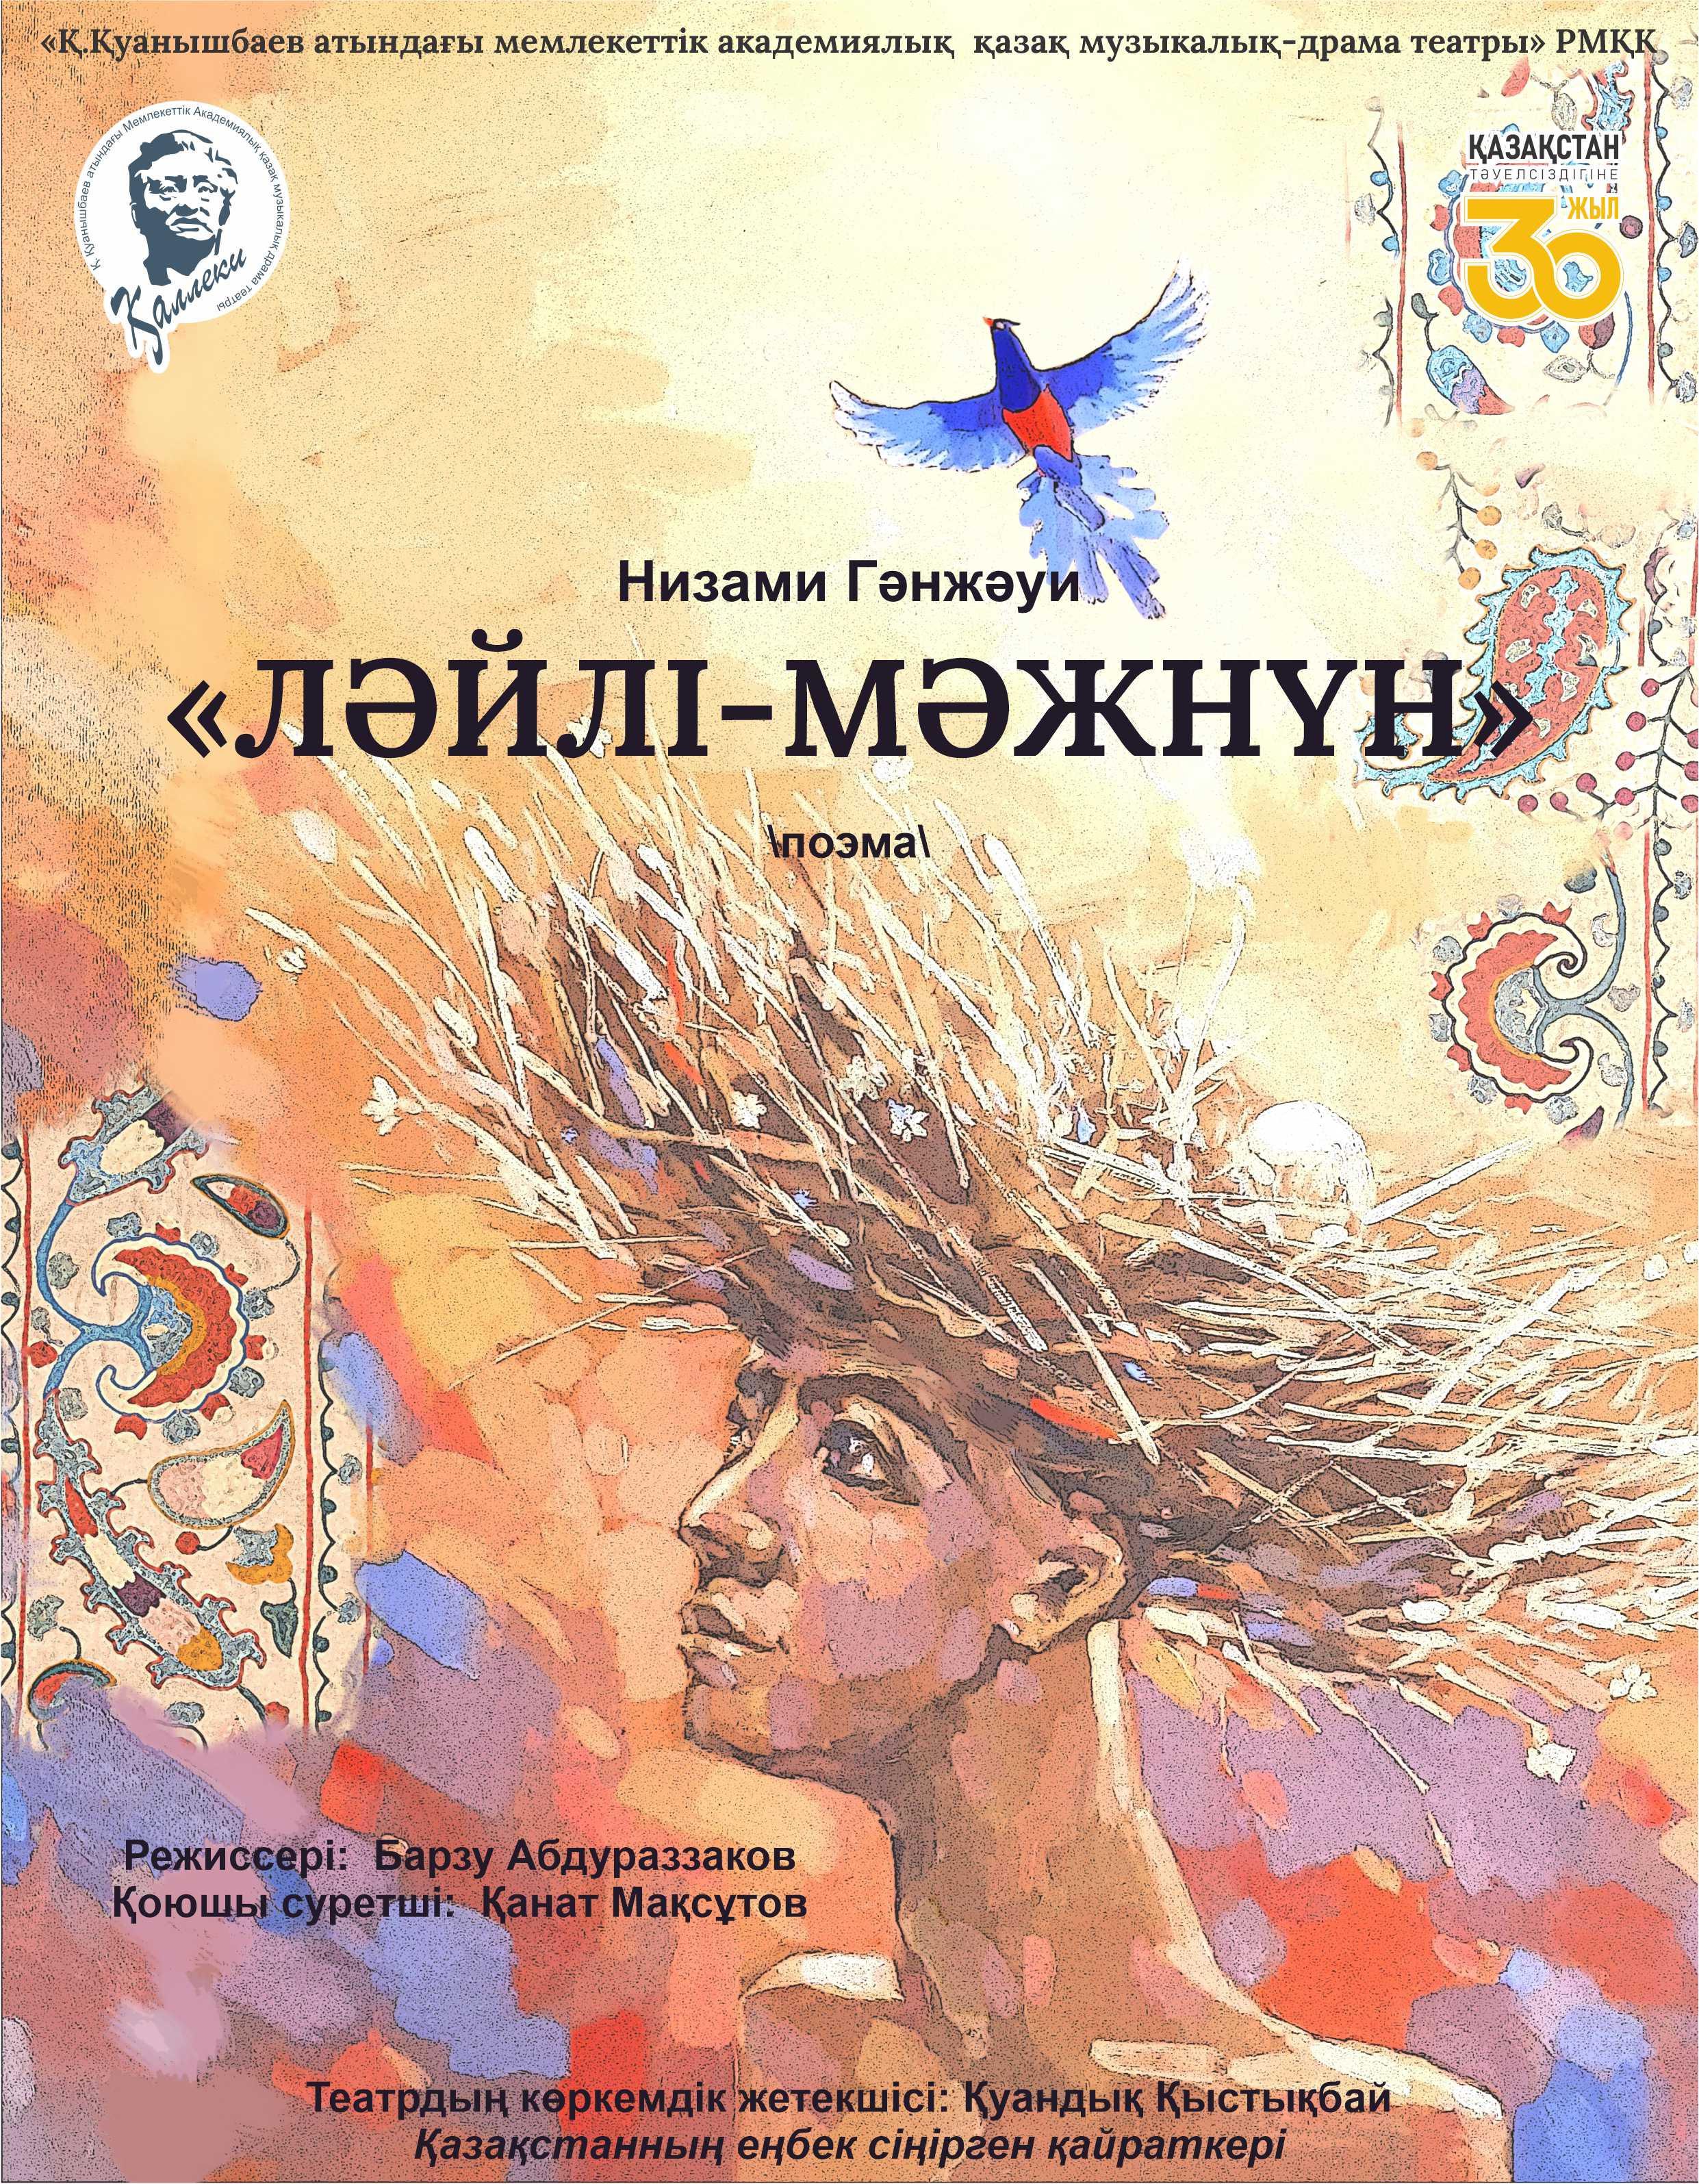 Ләйлі-Мәжнүн/Театр им. К. Куанышбаева